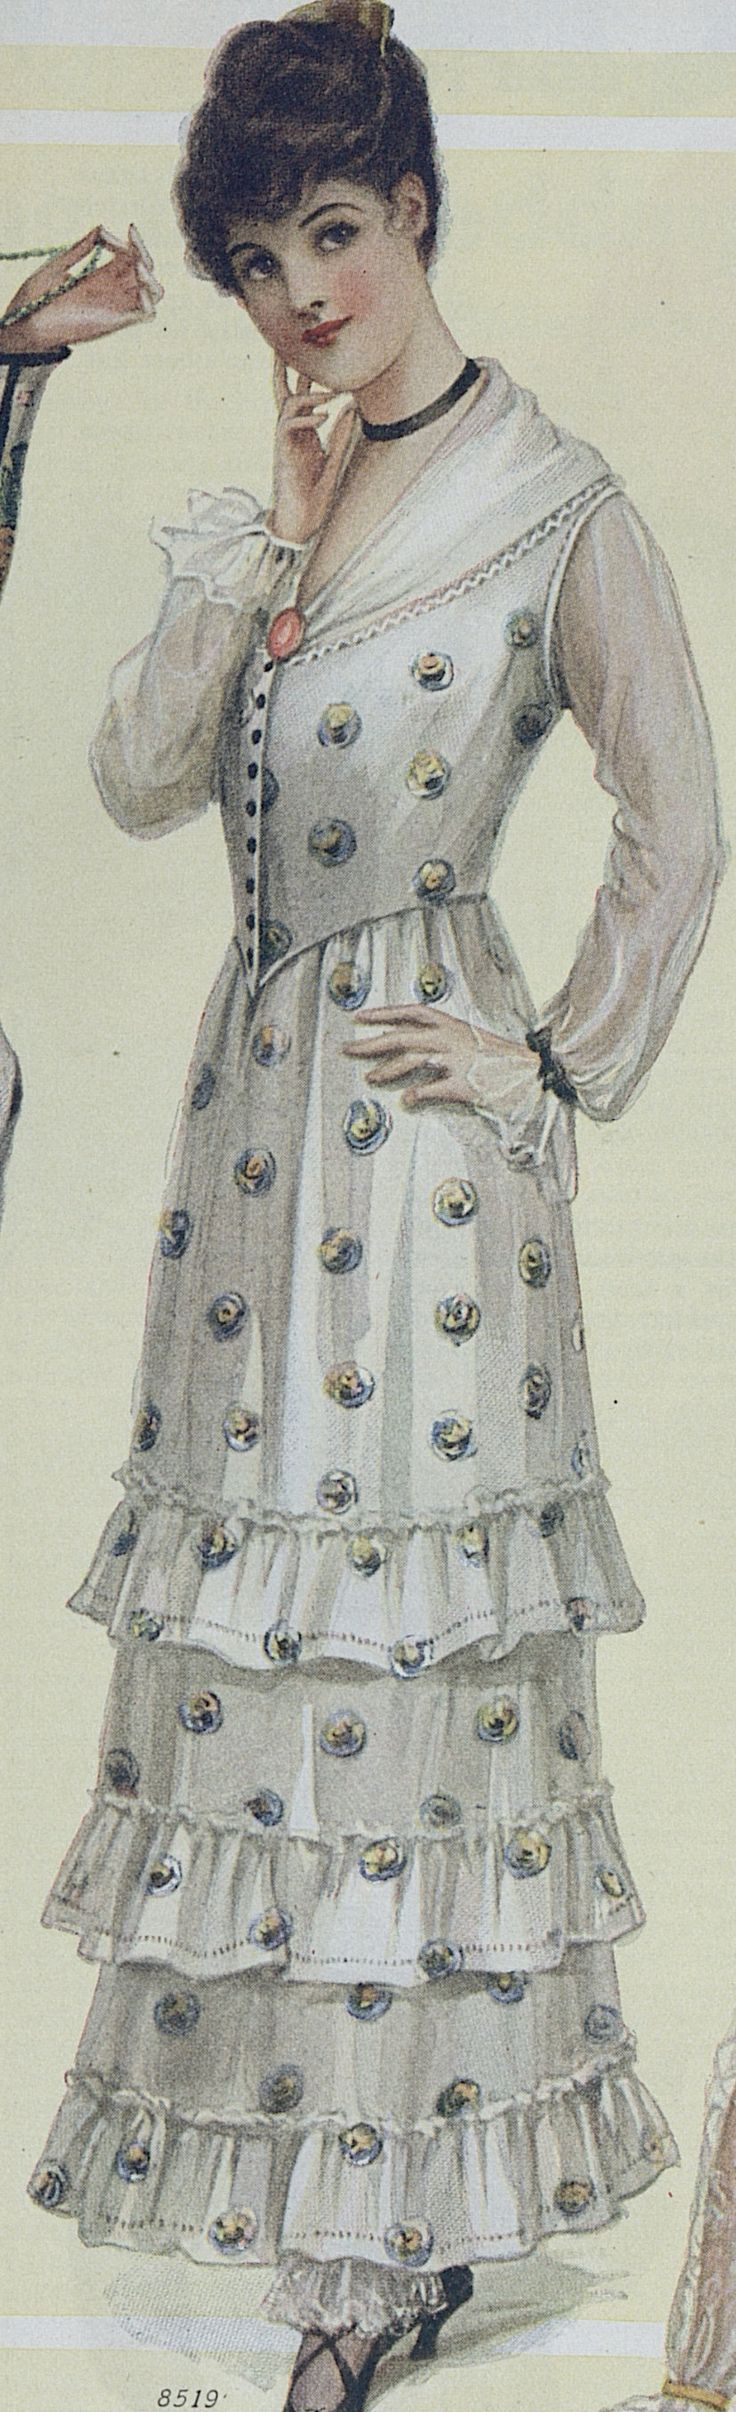 Regency Fashions for Ladies, Vintage Victorian Victorian era ladies fashion